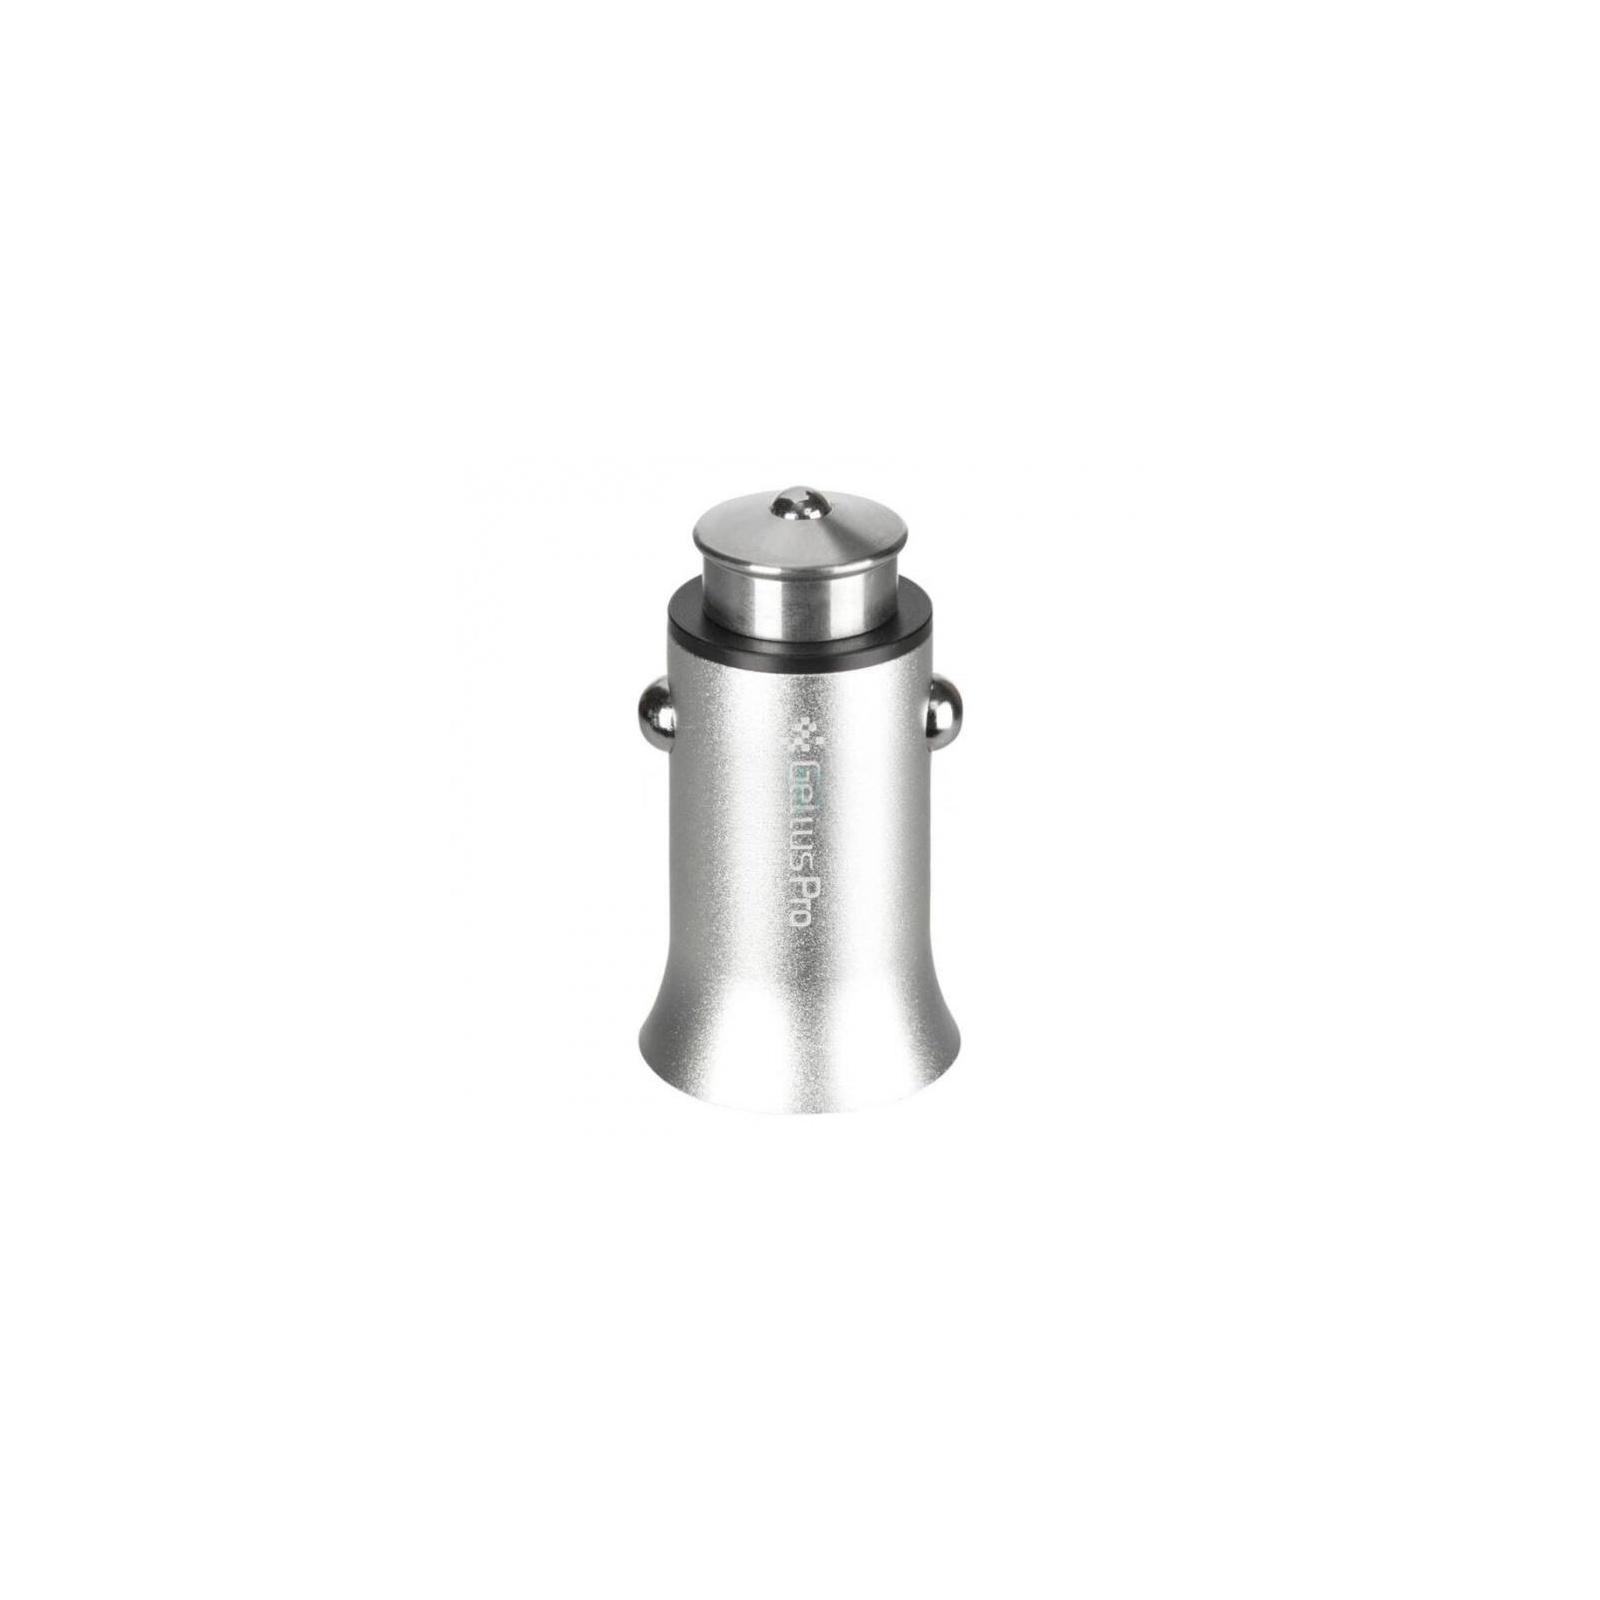 Зарядное устройство Gelius Pro Edition USB Fast Charger 5-12v 3A QC 3.0 (GL-03) Silver (62840)